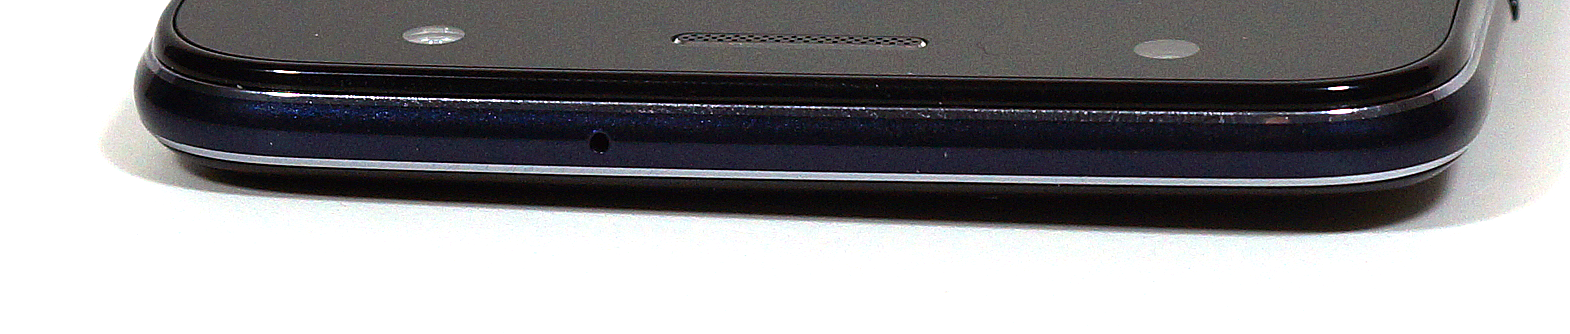 LG X power2 Smartphone Review - NotebookCheck net Reviews